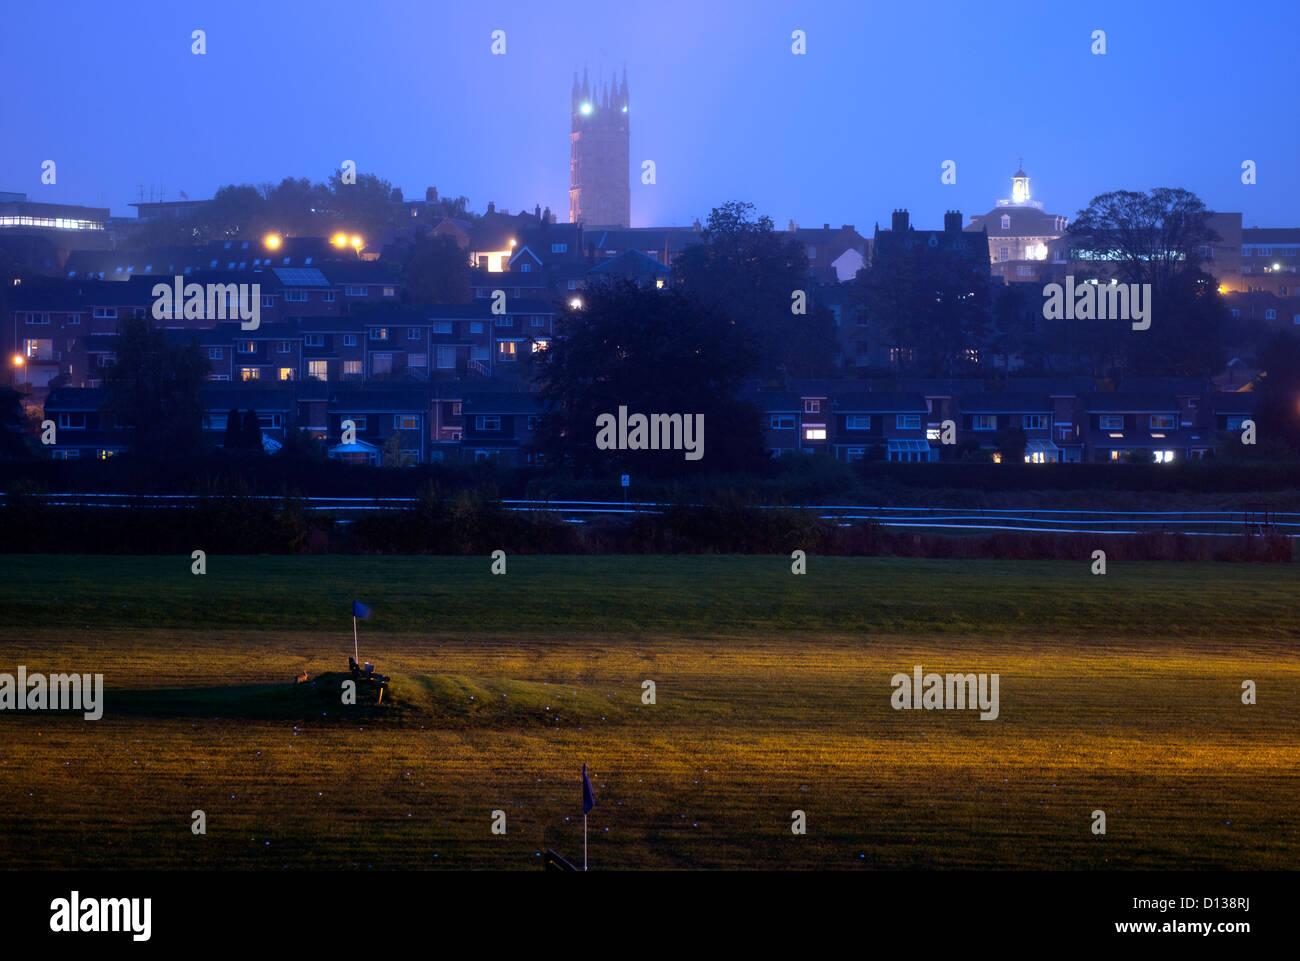 Warwick town centre and golf driving range, Warwickshire, England, UK - Stock Image